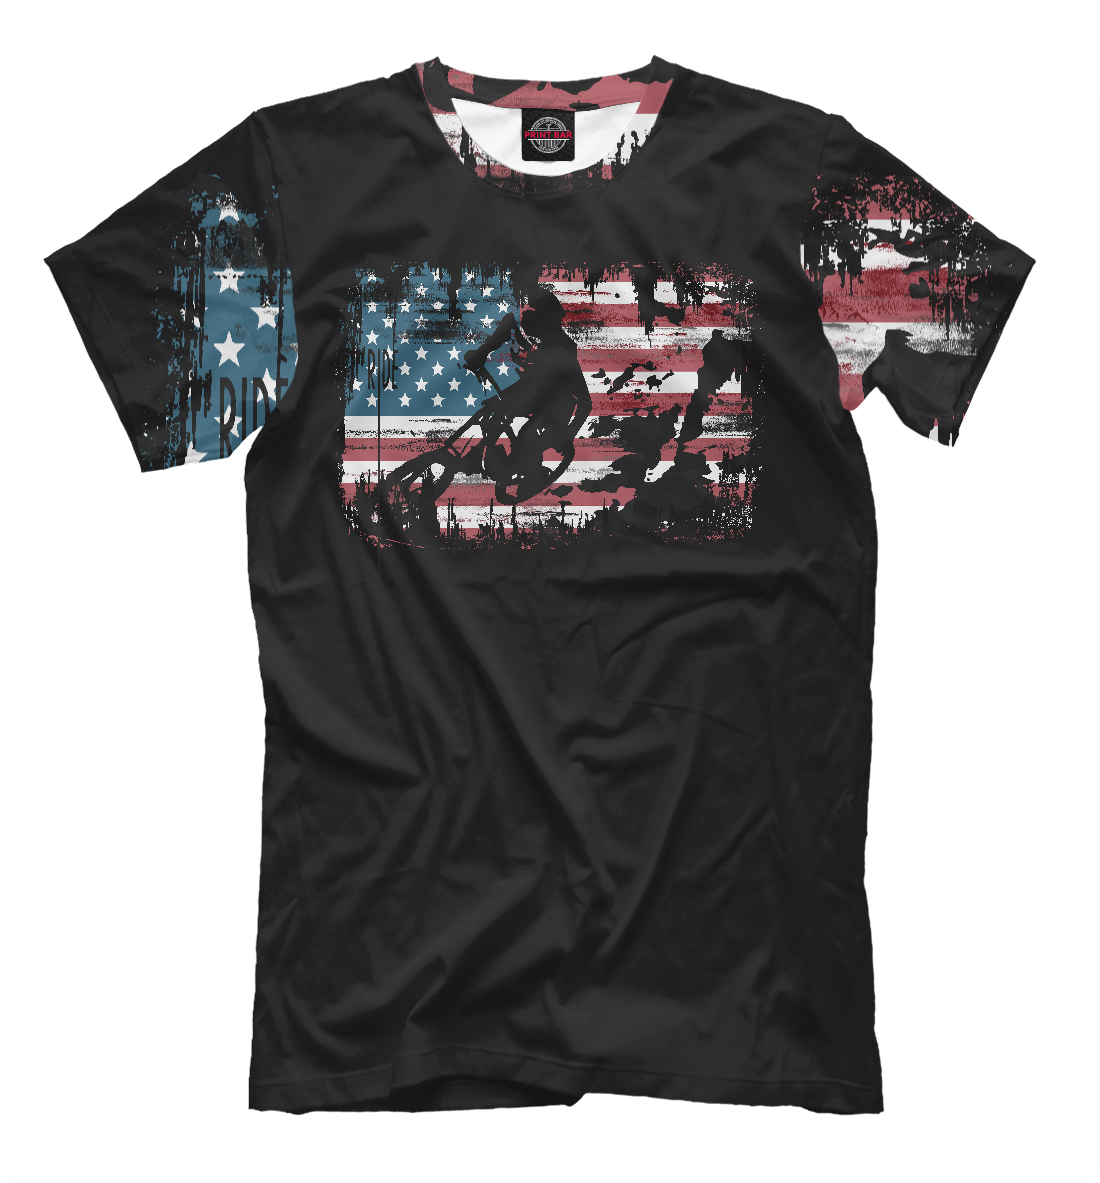 Купить Ride USA, Printbar, Футболки, BCL-848717-fut-2